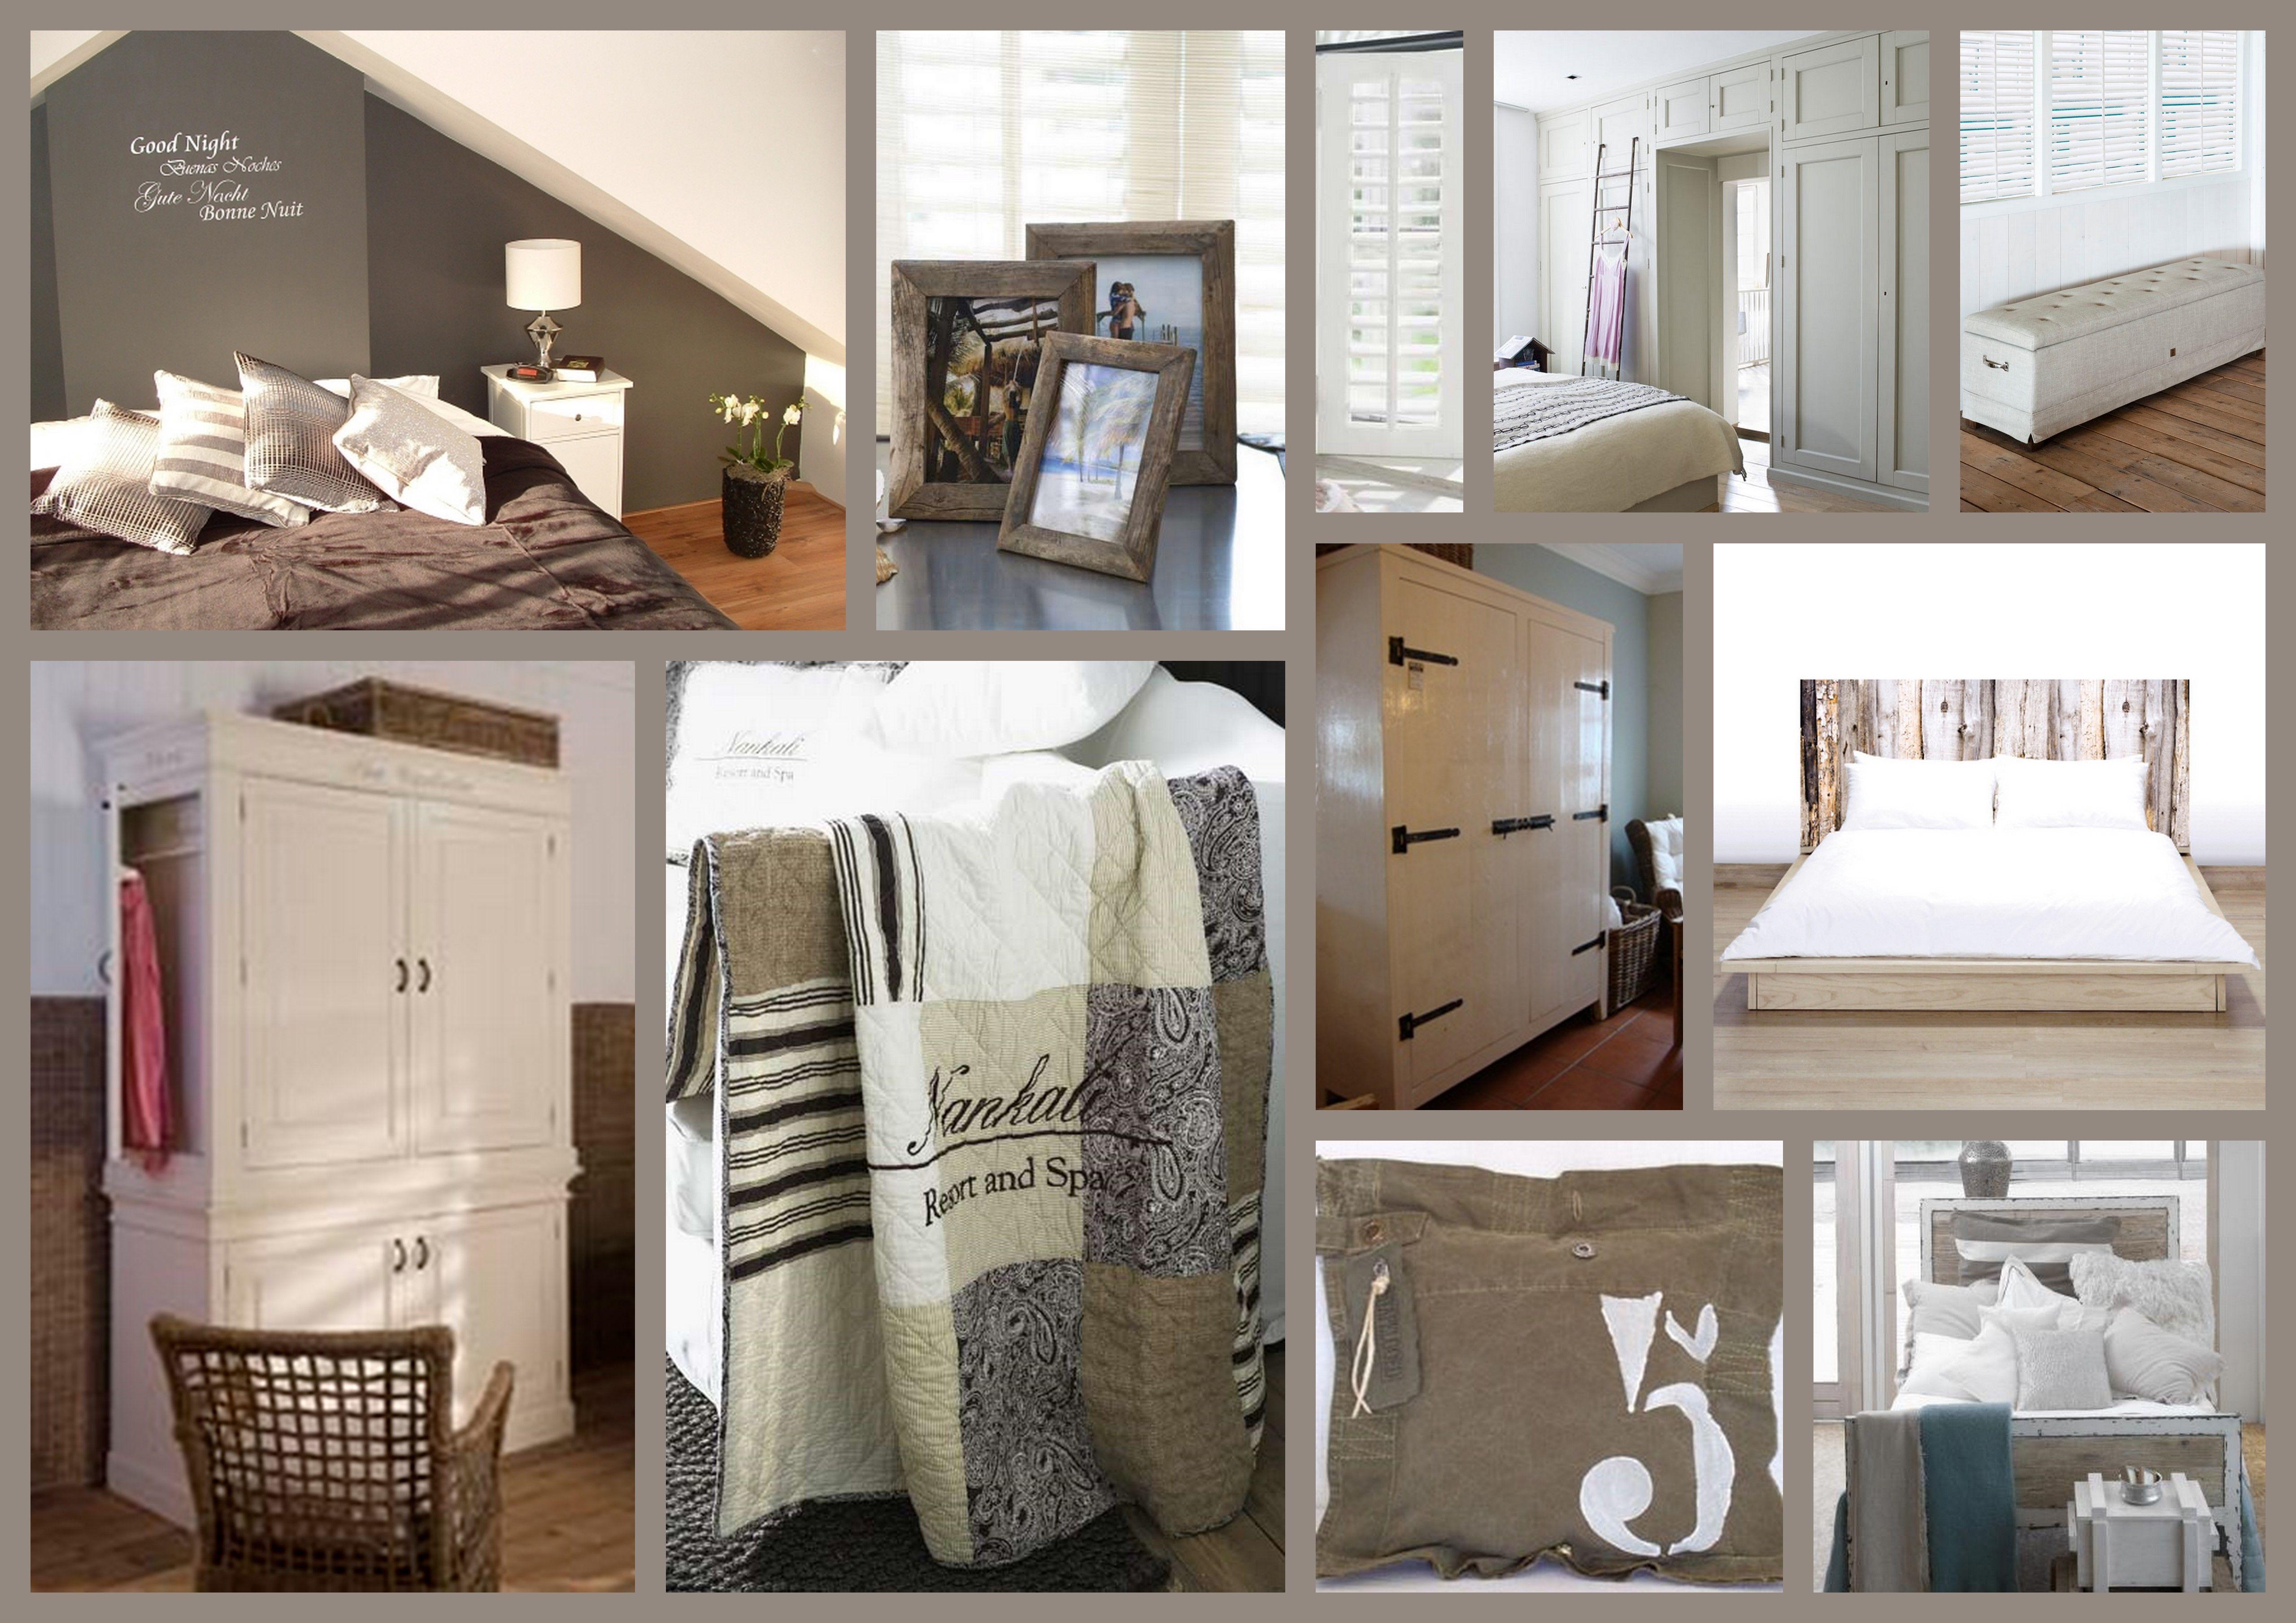 Fotos Slaapkamer Restylen : Restyling ouder slaapkamer opdracht buitengewoonbinnen